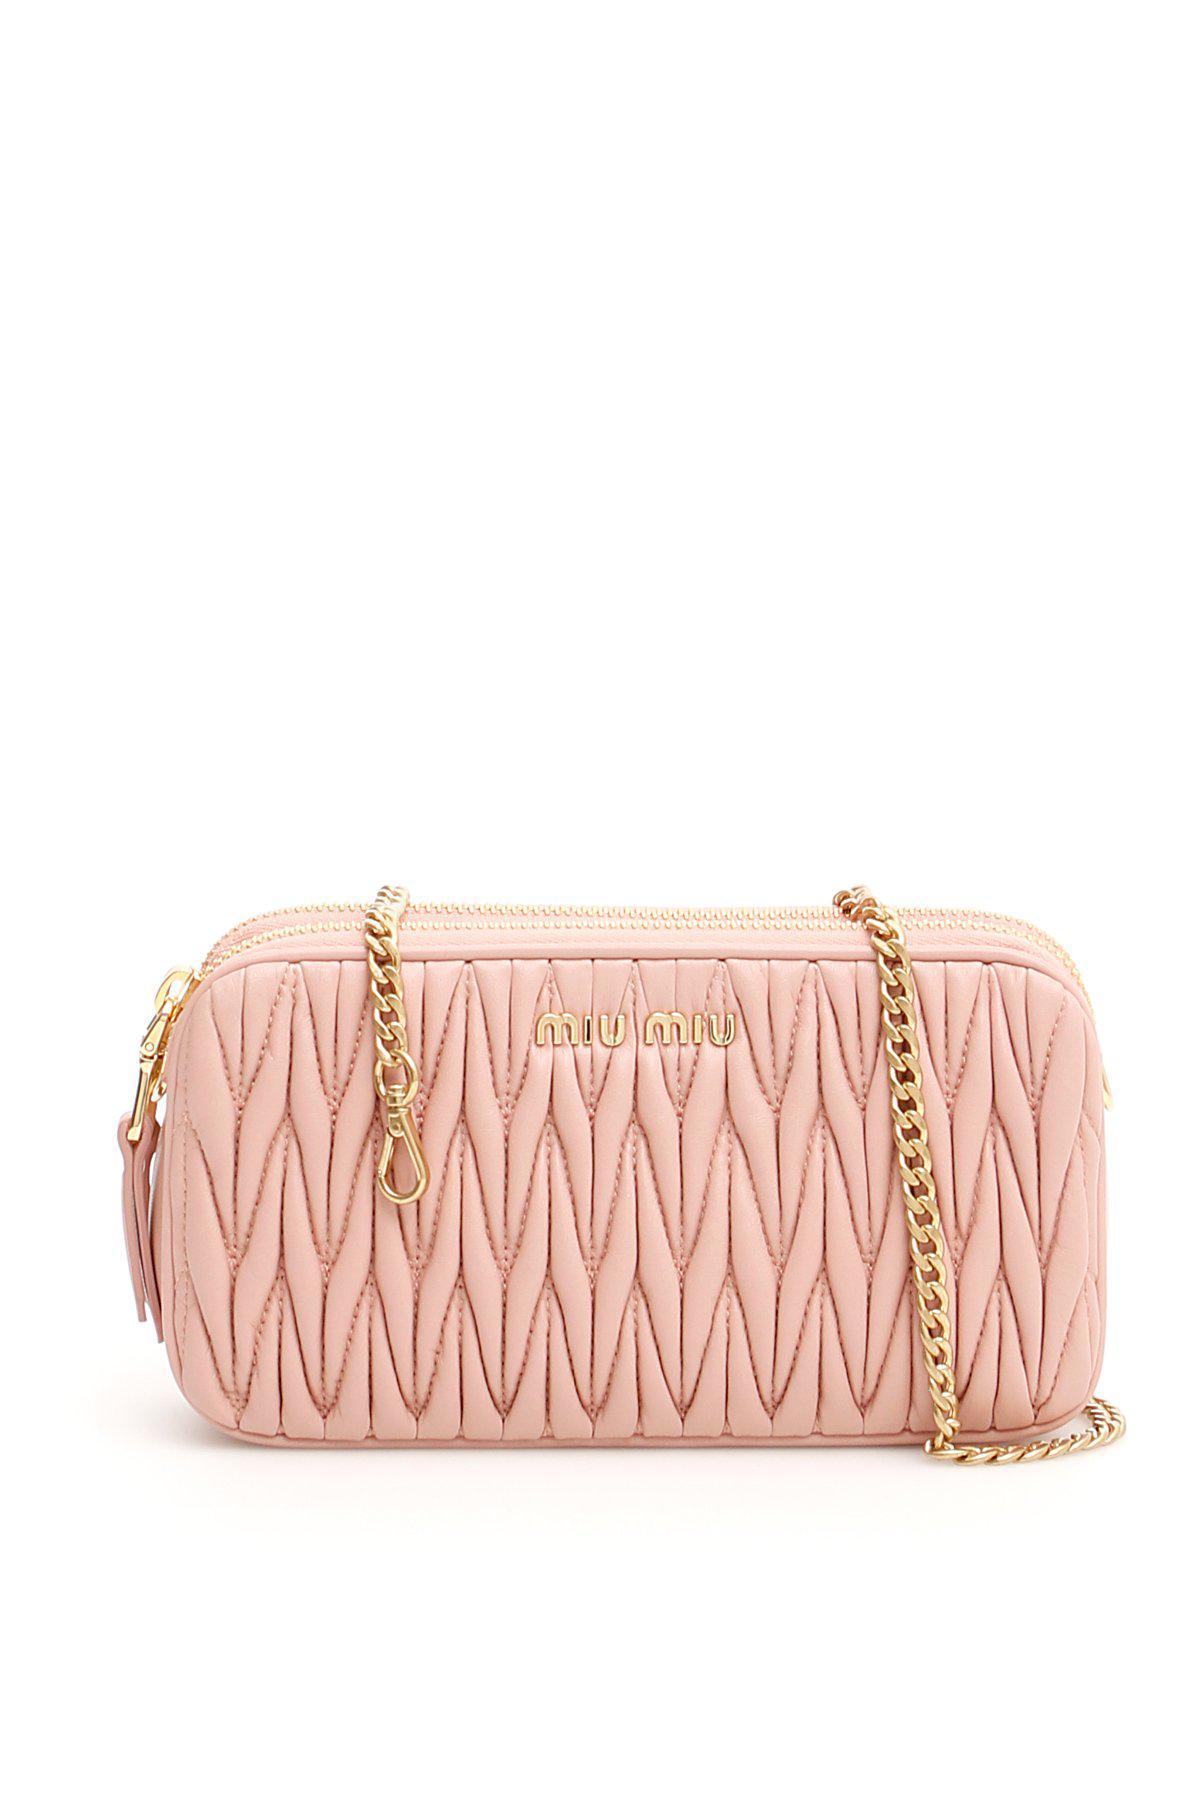 Miu Miu - Pink Matelassé Mini Bag - Lyst. View fullscreen d0db281f48